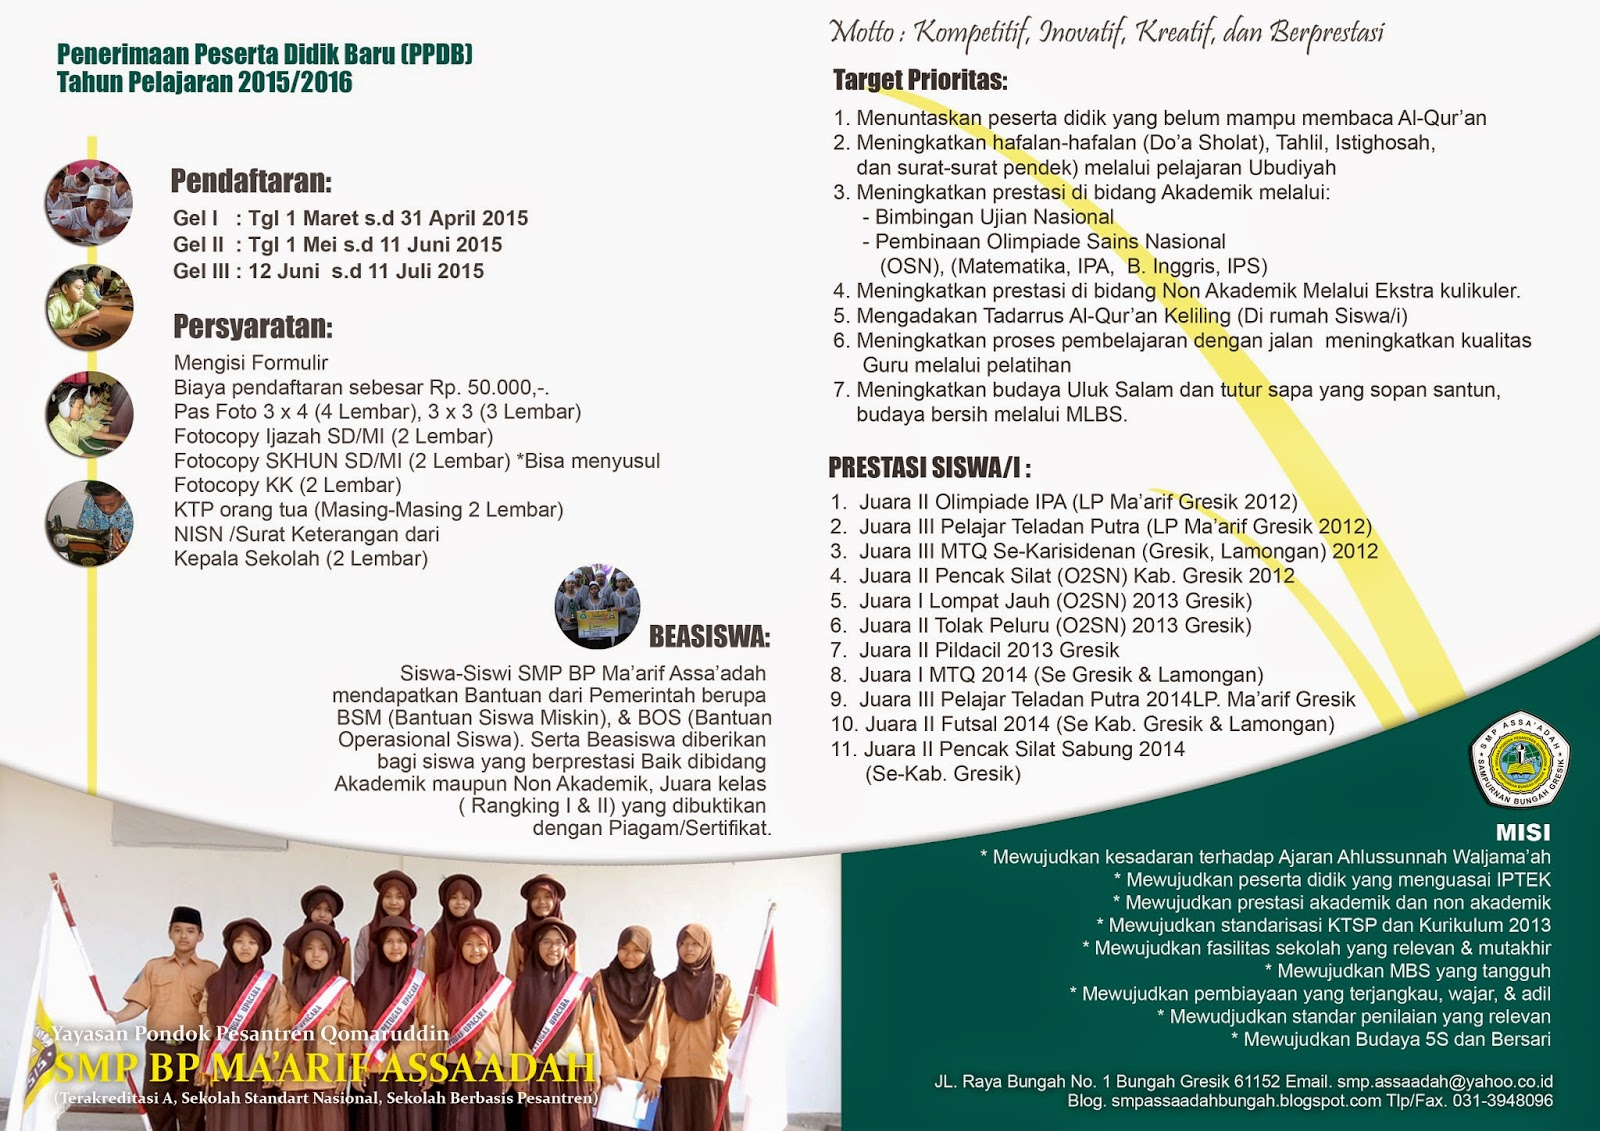 PENERIMAAN PESERTA DIDIK BARU TAHUN PELAJARAN 2014 -2015